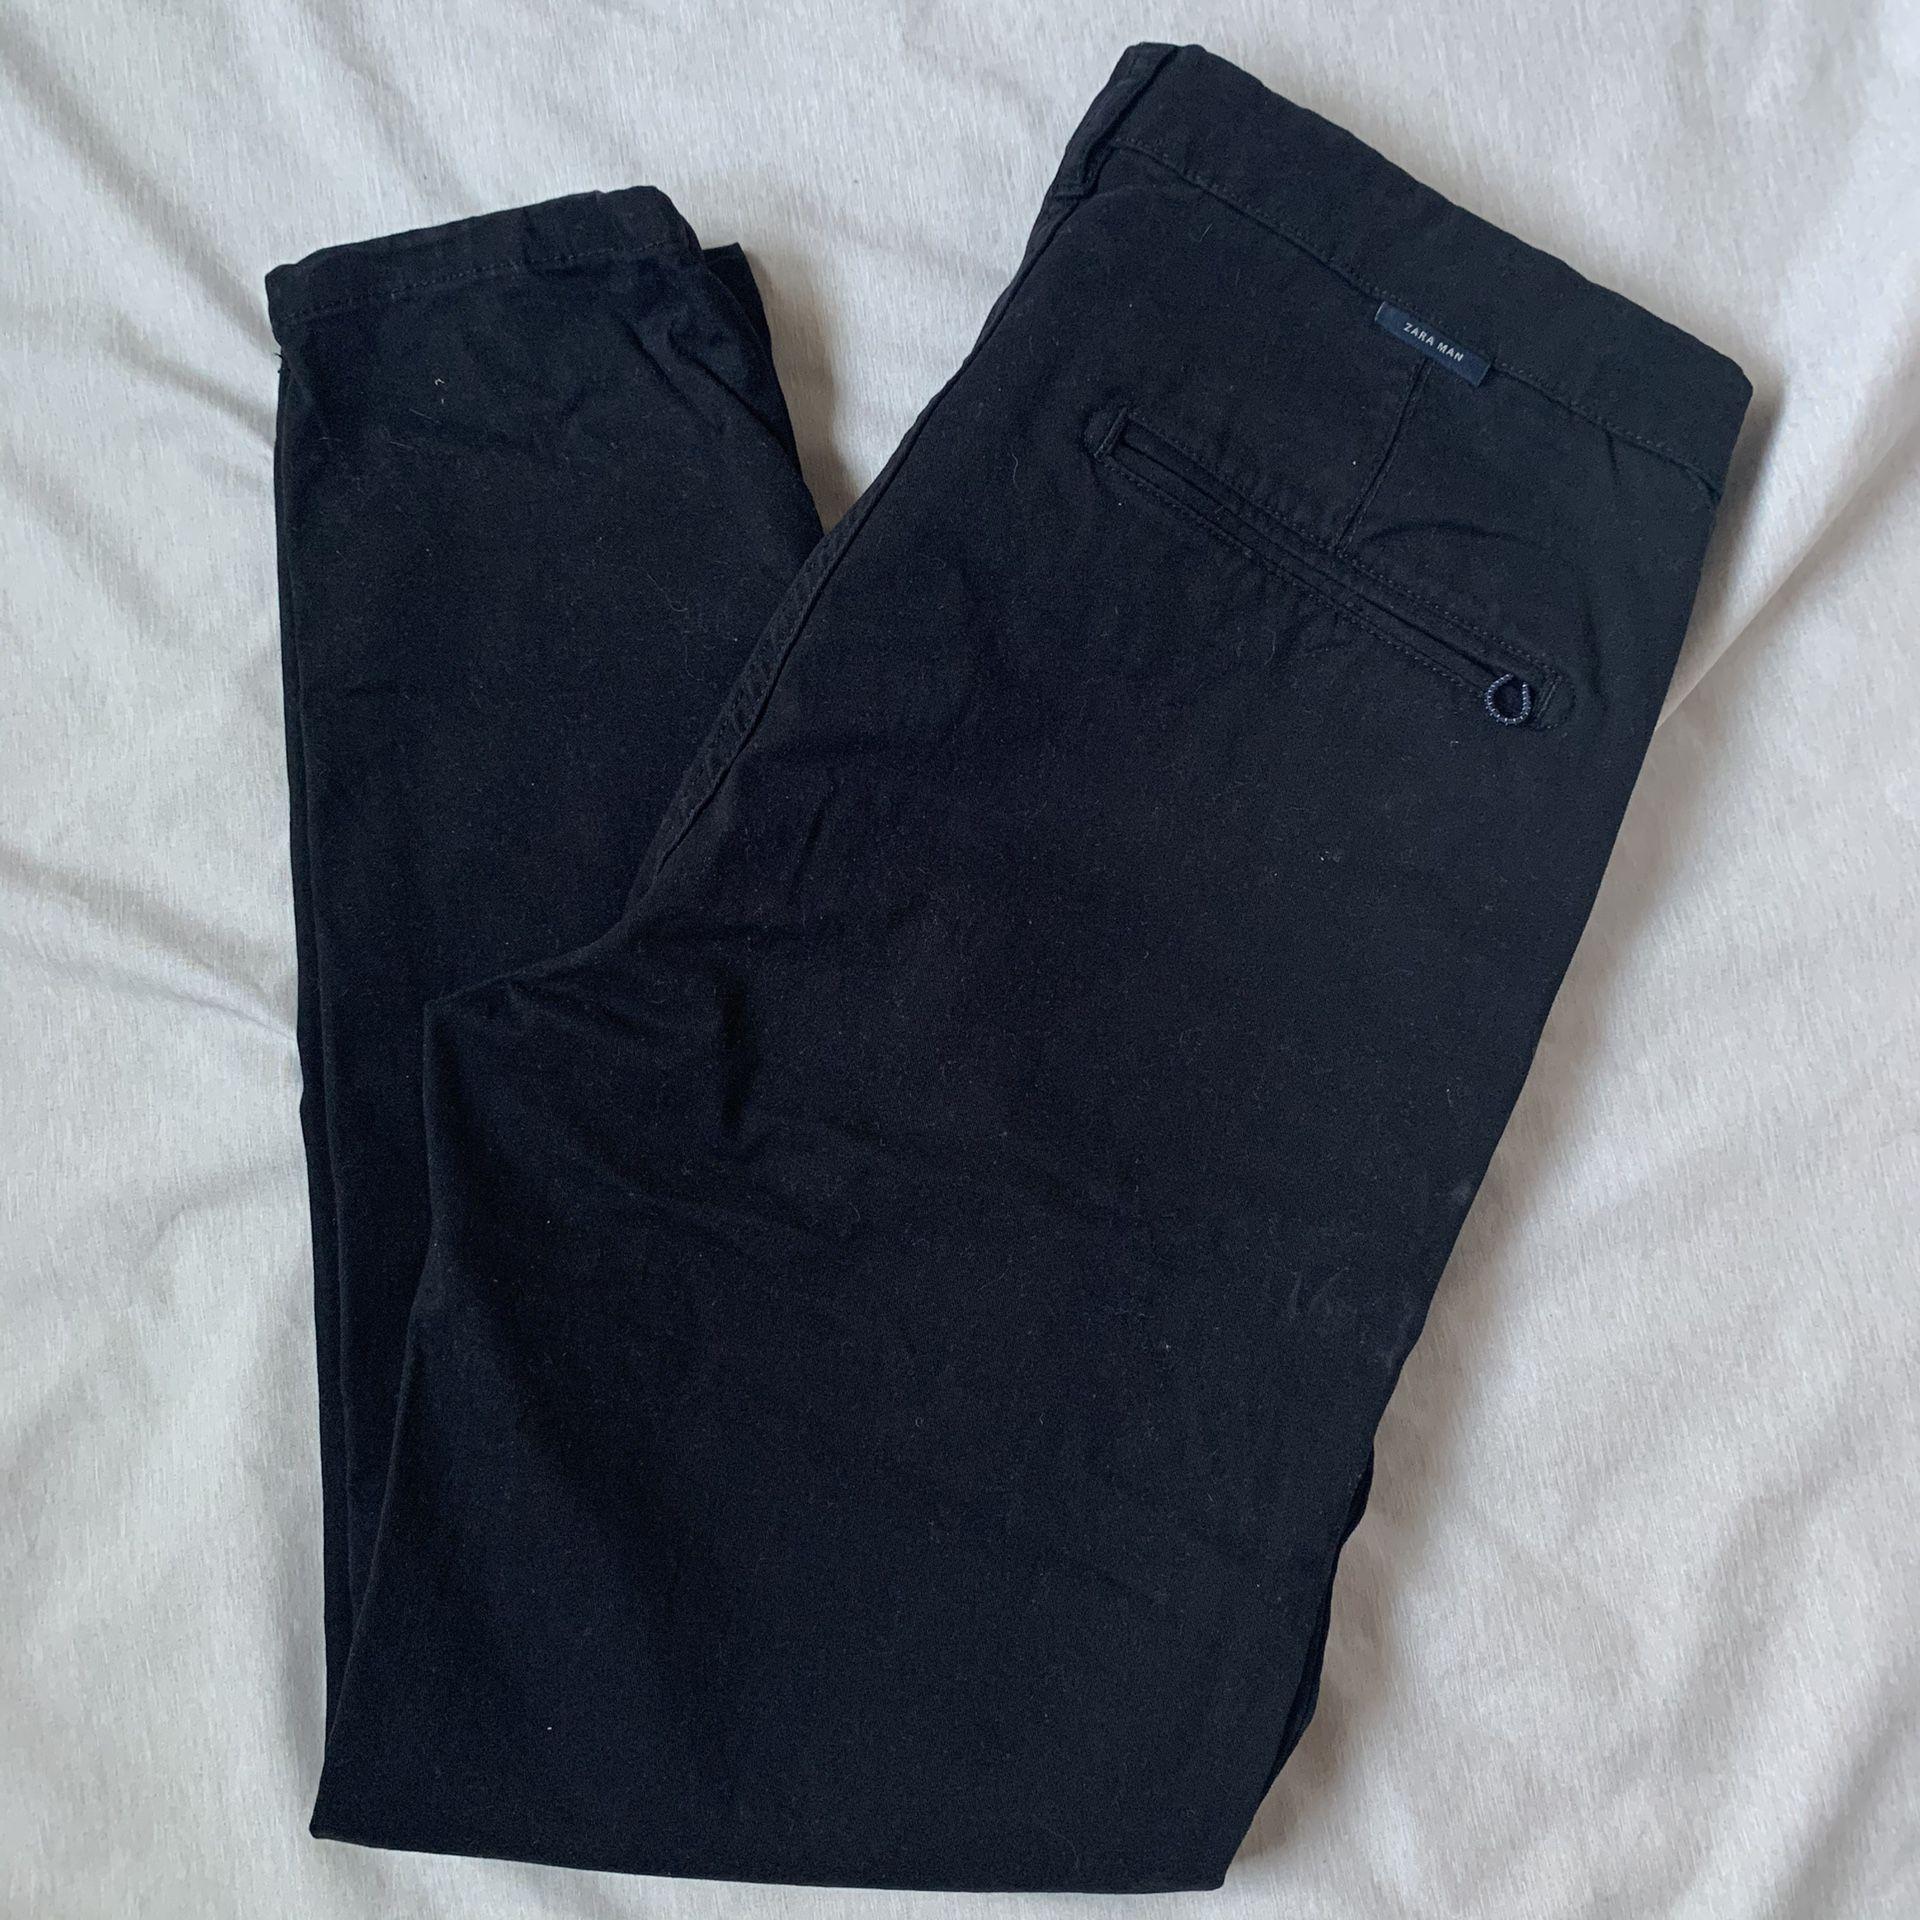 Zara Man Ankle chinos Black